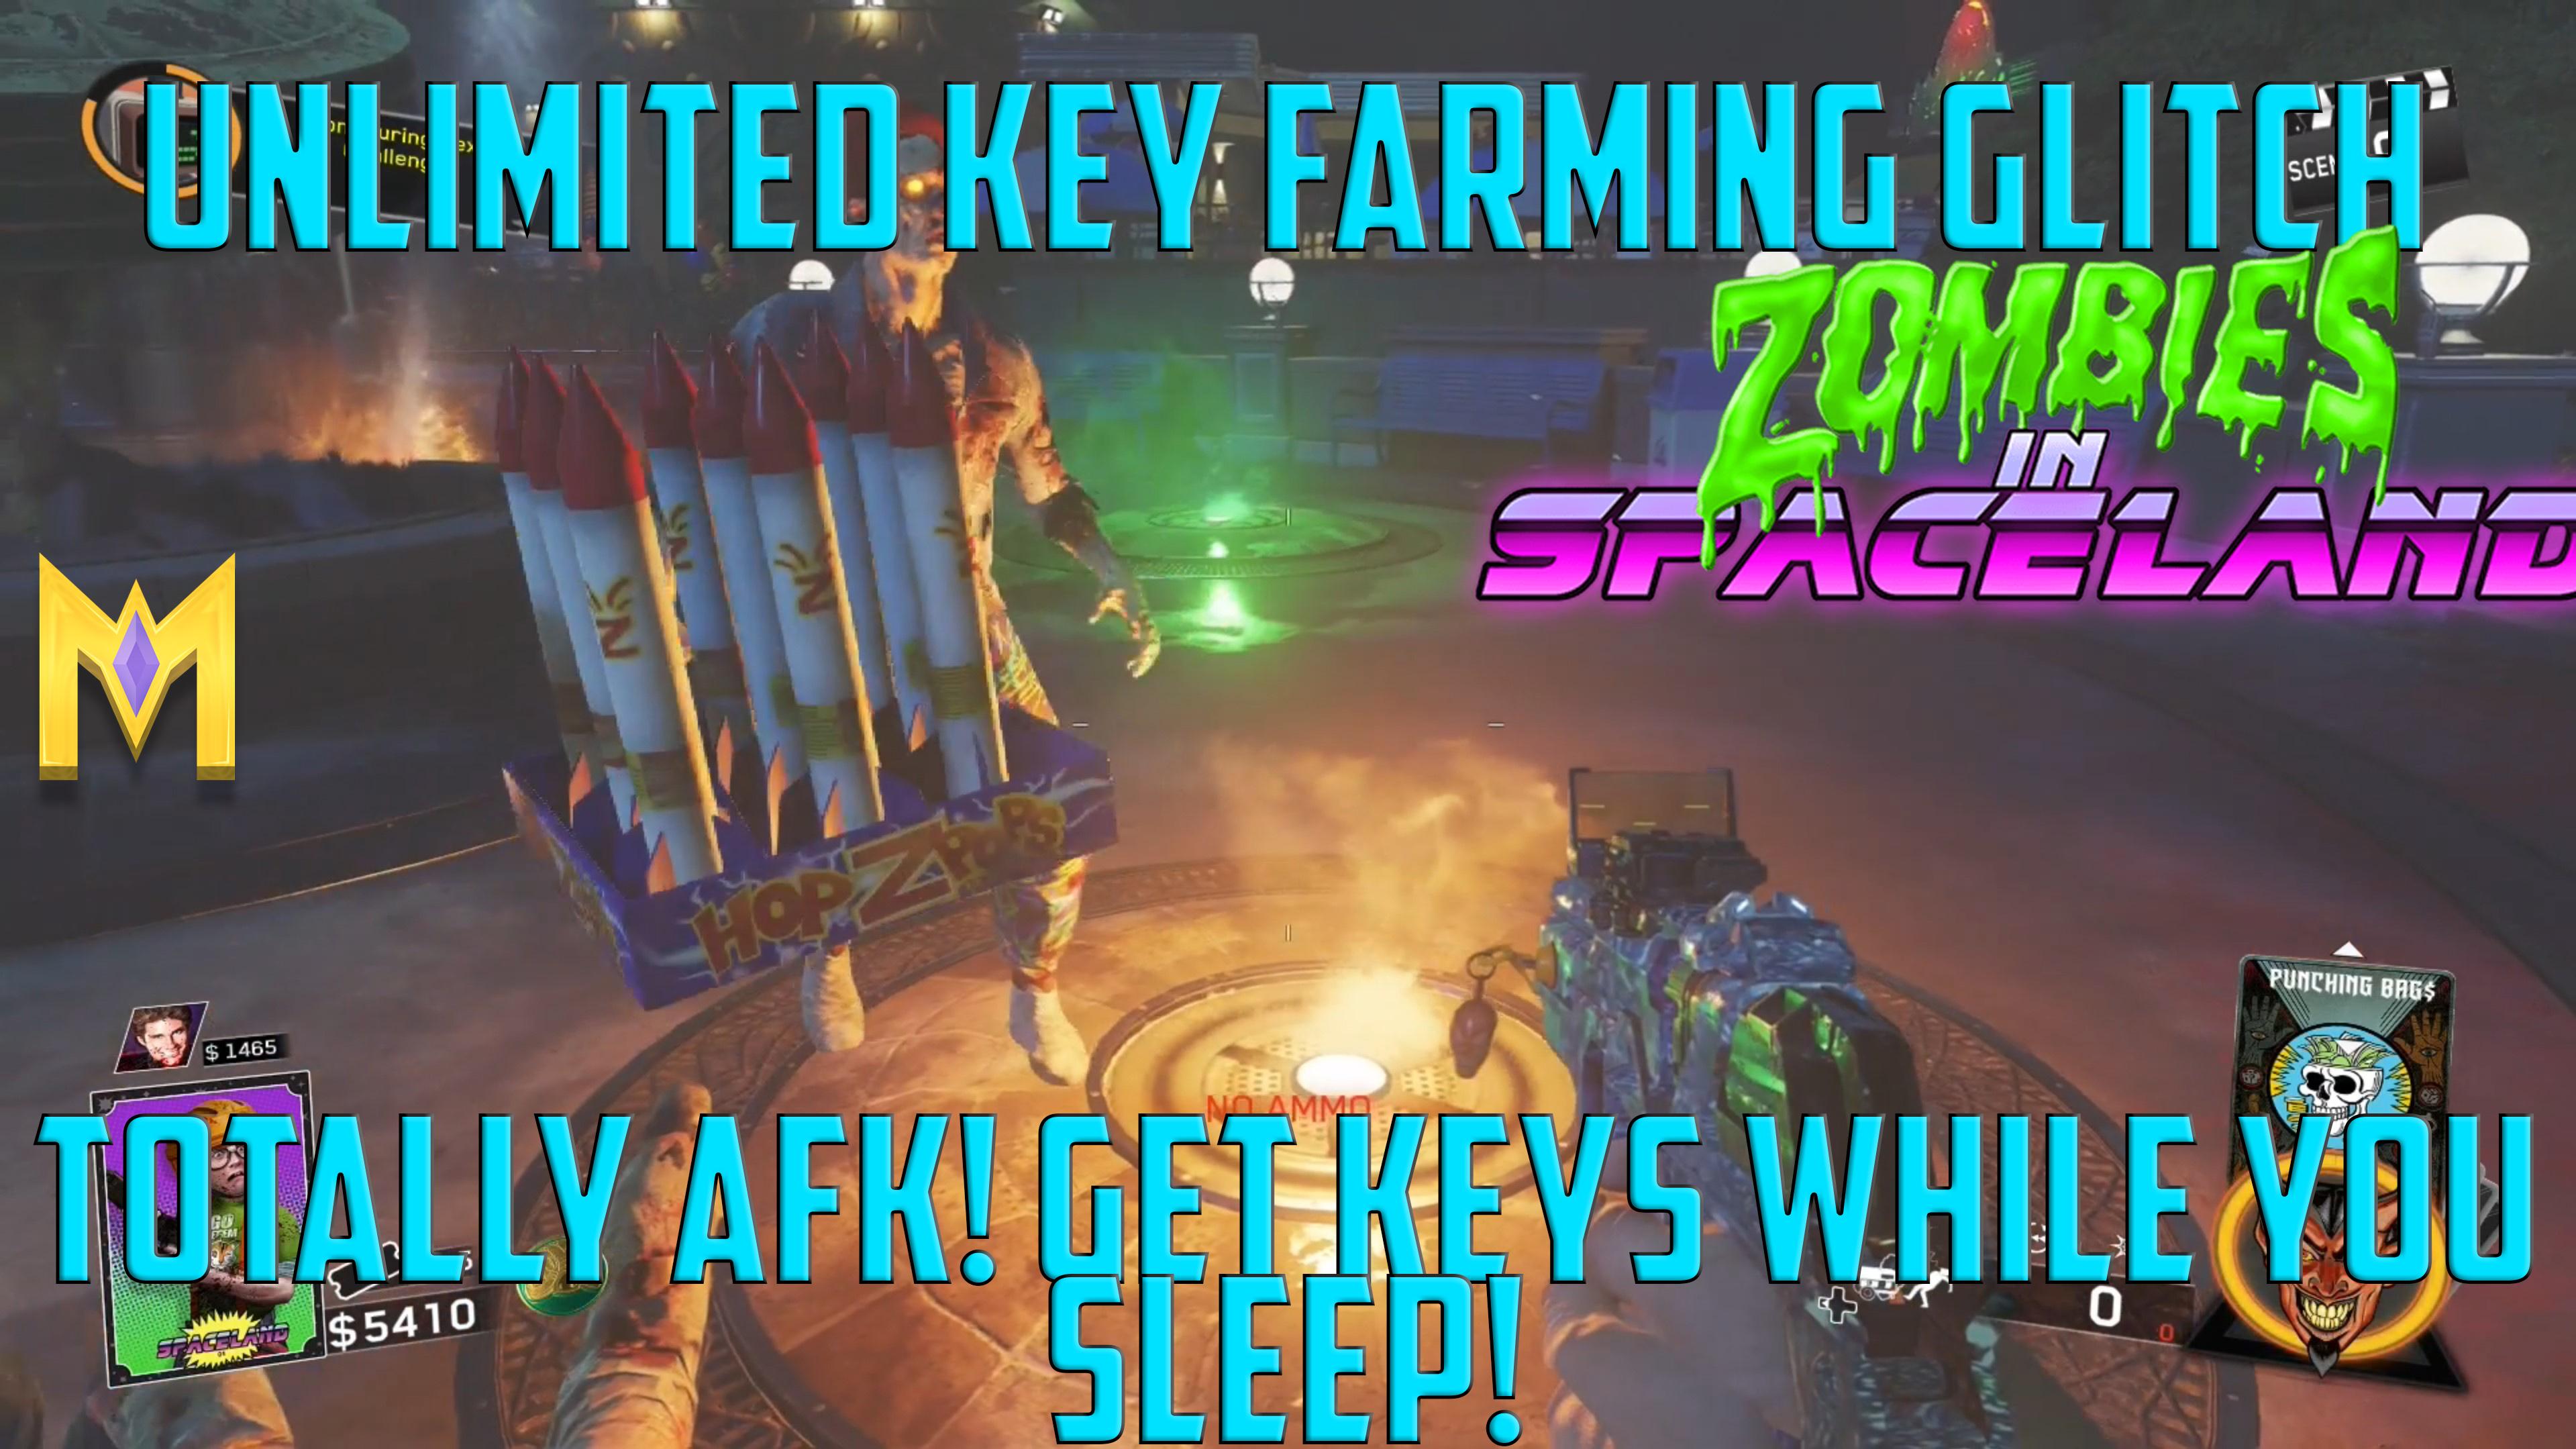 Zombies In Spaceland Glitches – Unlimited Key Farming Glitch – AFK Farming Method